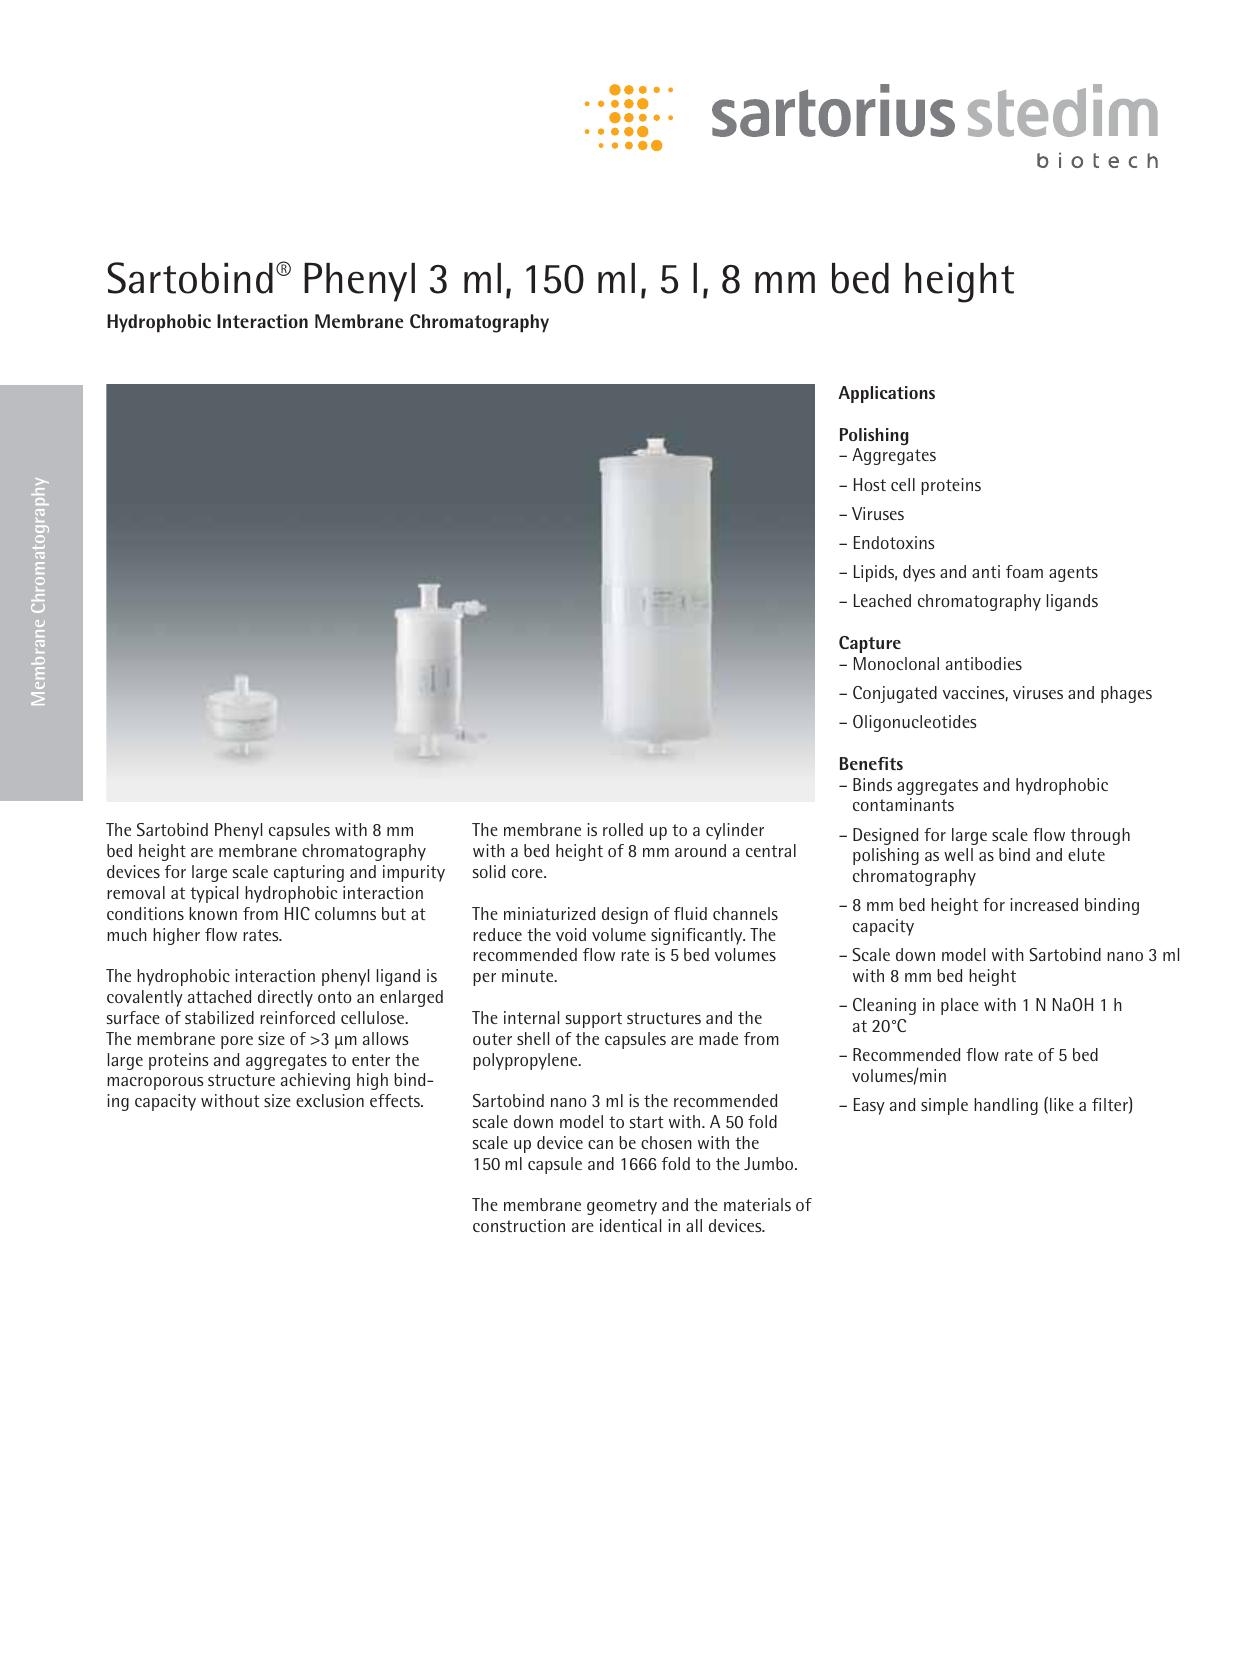 Sartobind Phenyl 3 Ml 150 Ml 5 L 8 Mm Bed Height